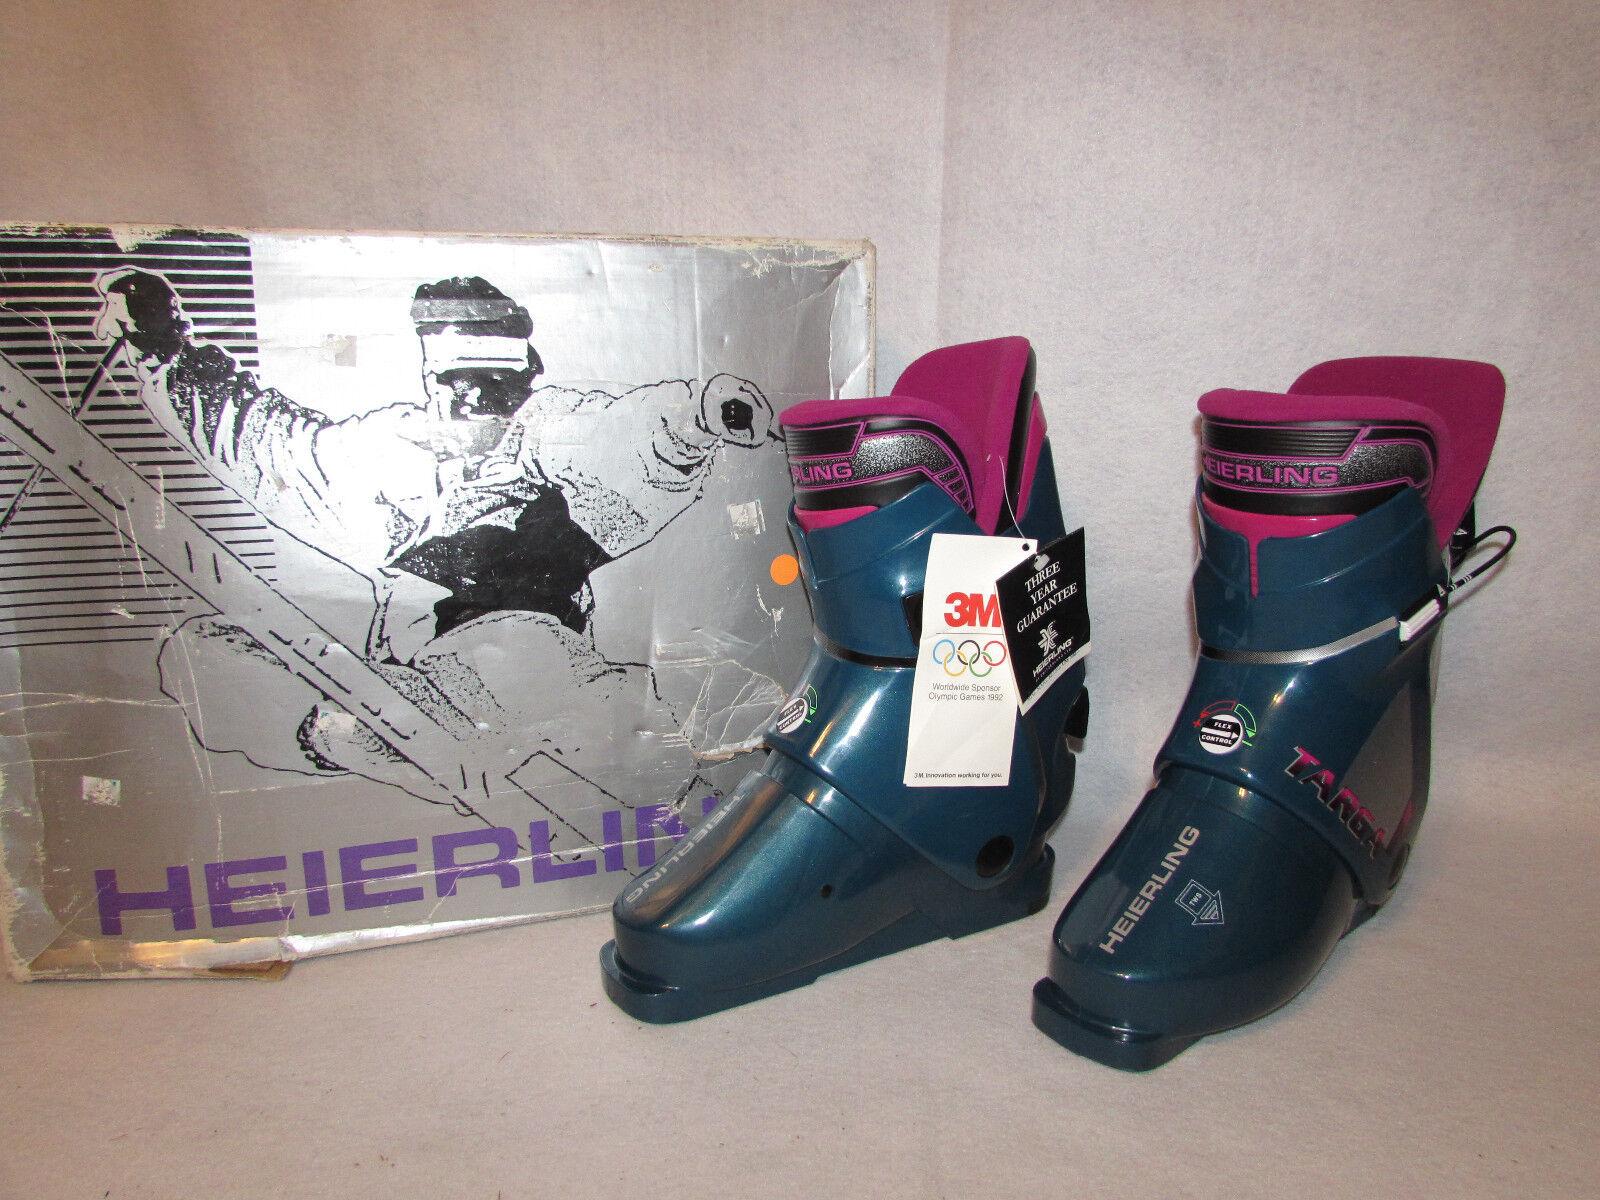 NIB W TAGS HEIERLING TARGA UNISEX SKI Stiefel Größe MEN 7.5 damen 8.5 MADE IN ITALY